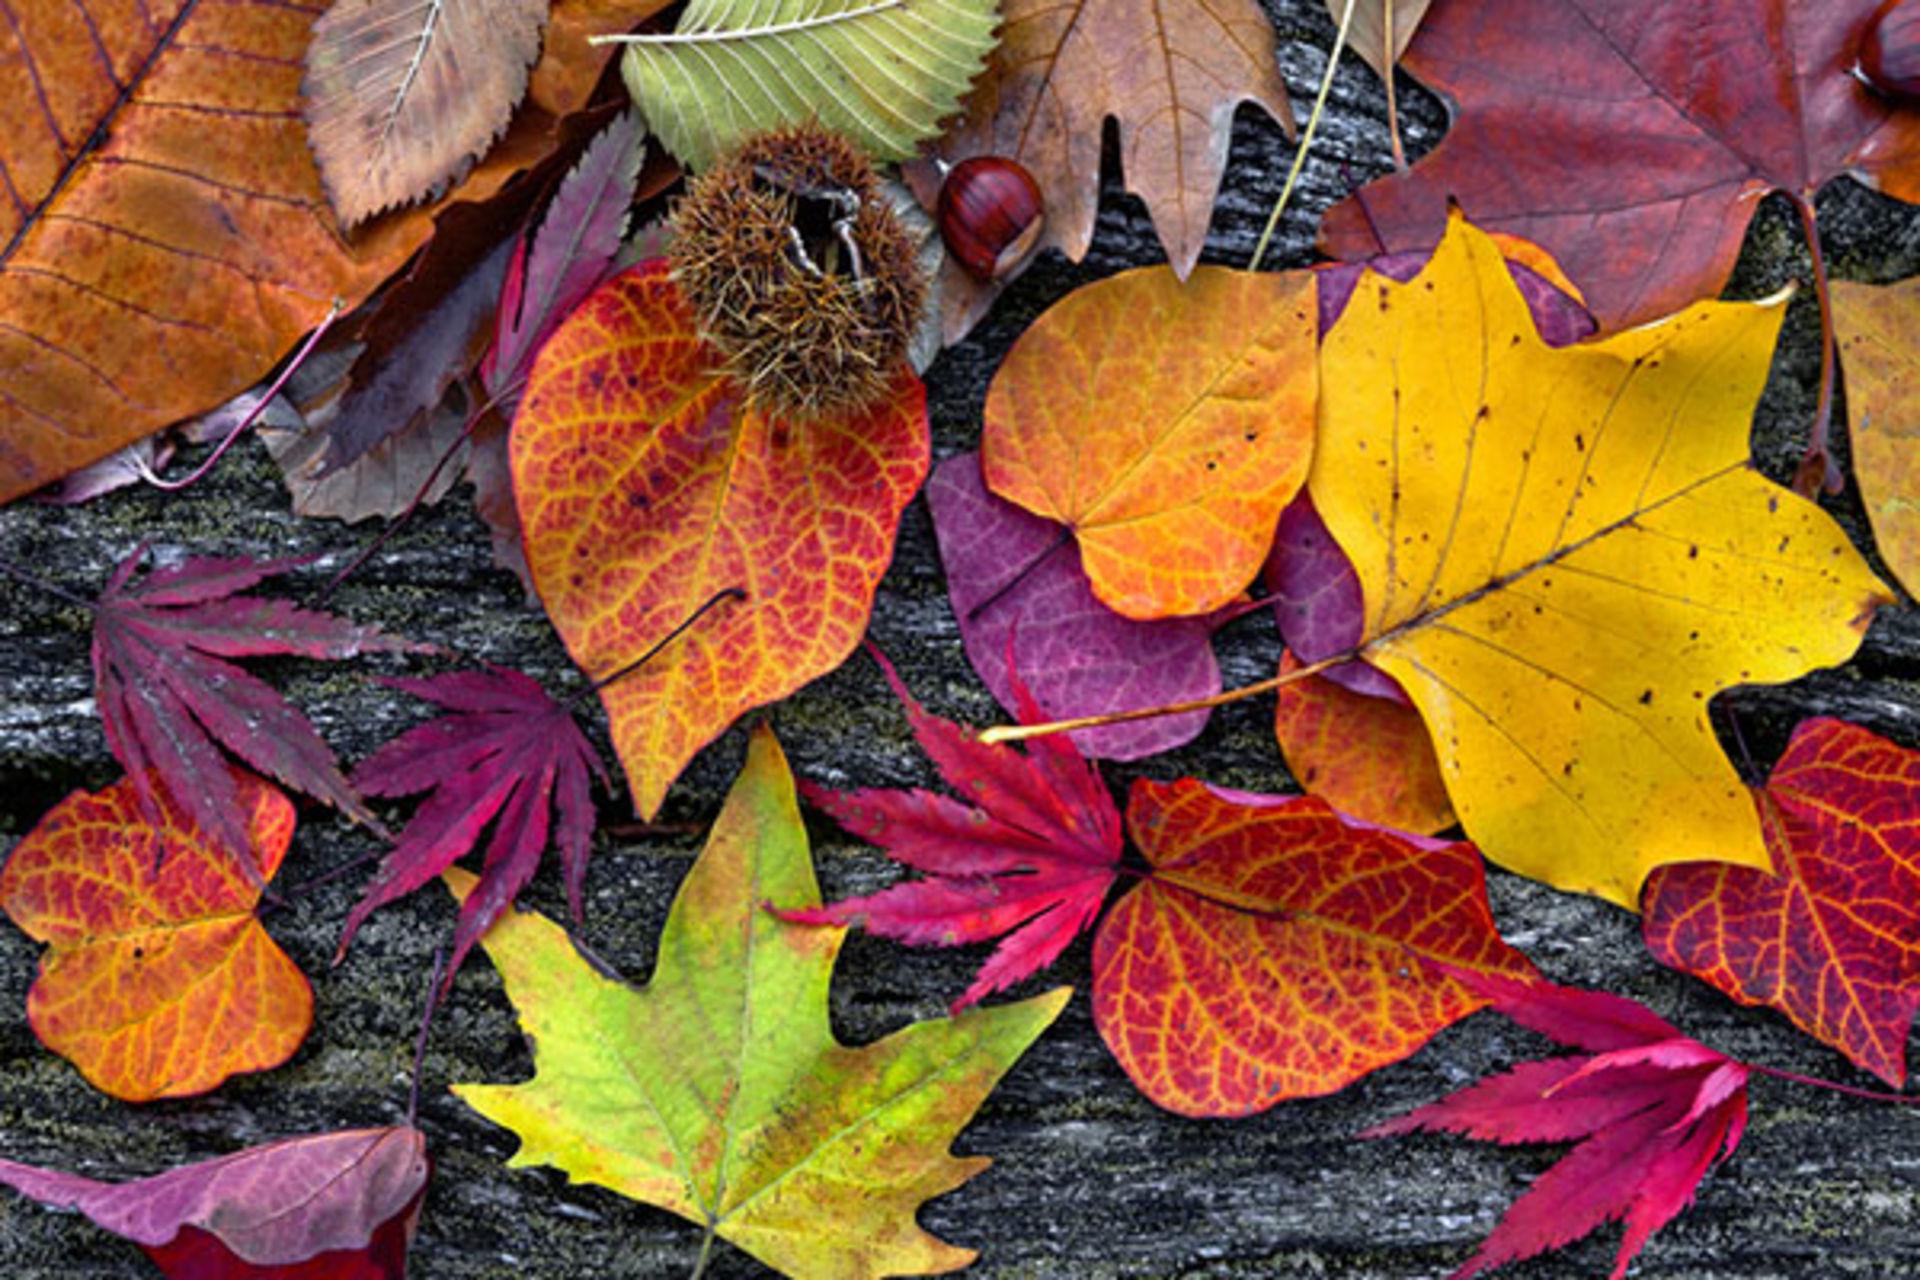 Checklist for fall